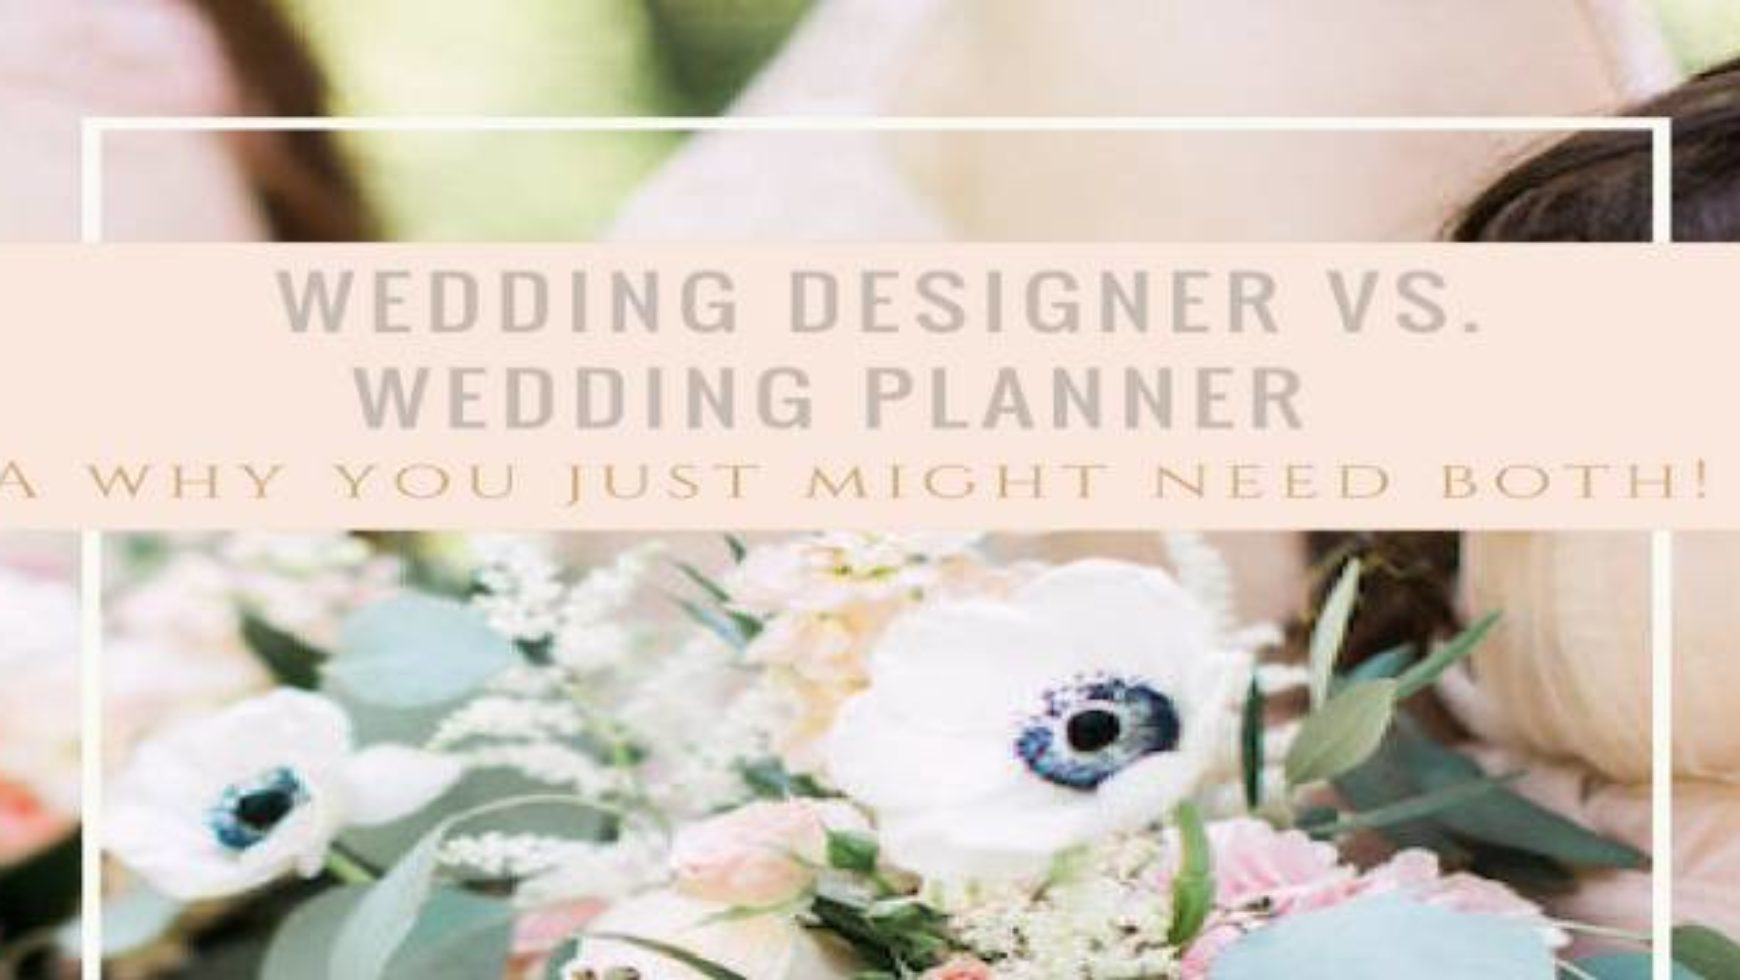 Wedding Planner Vs Wedding Designer